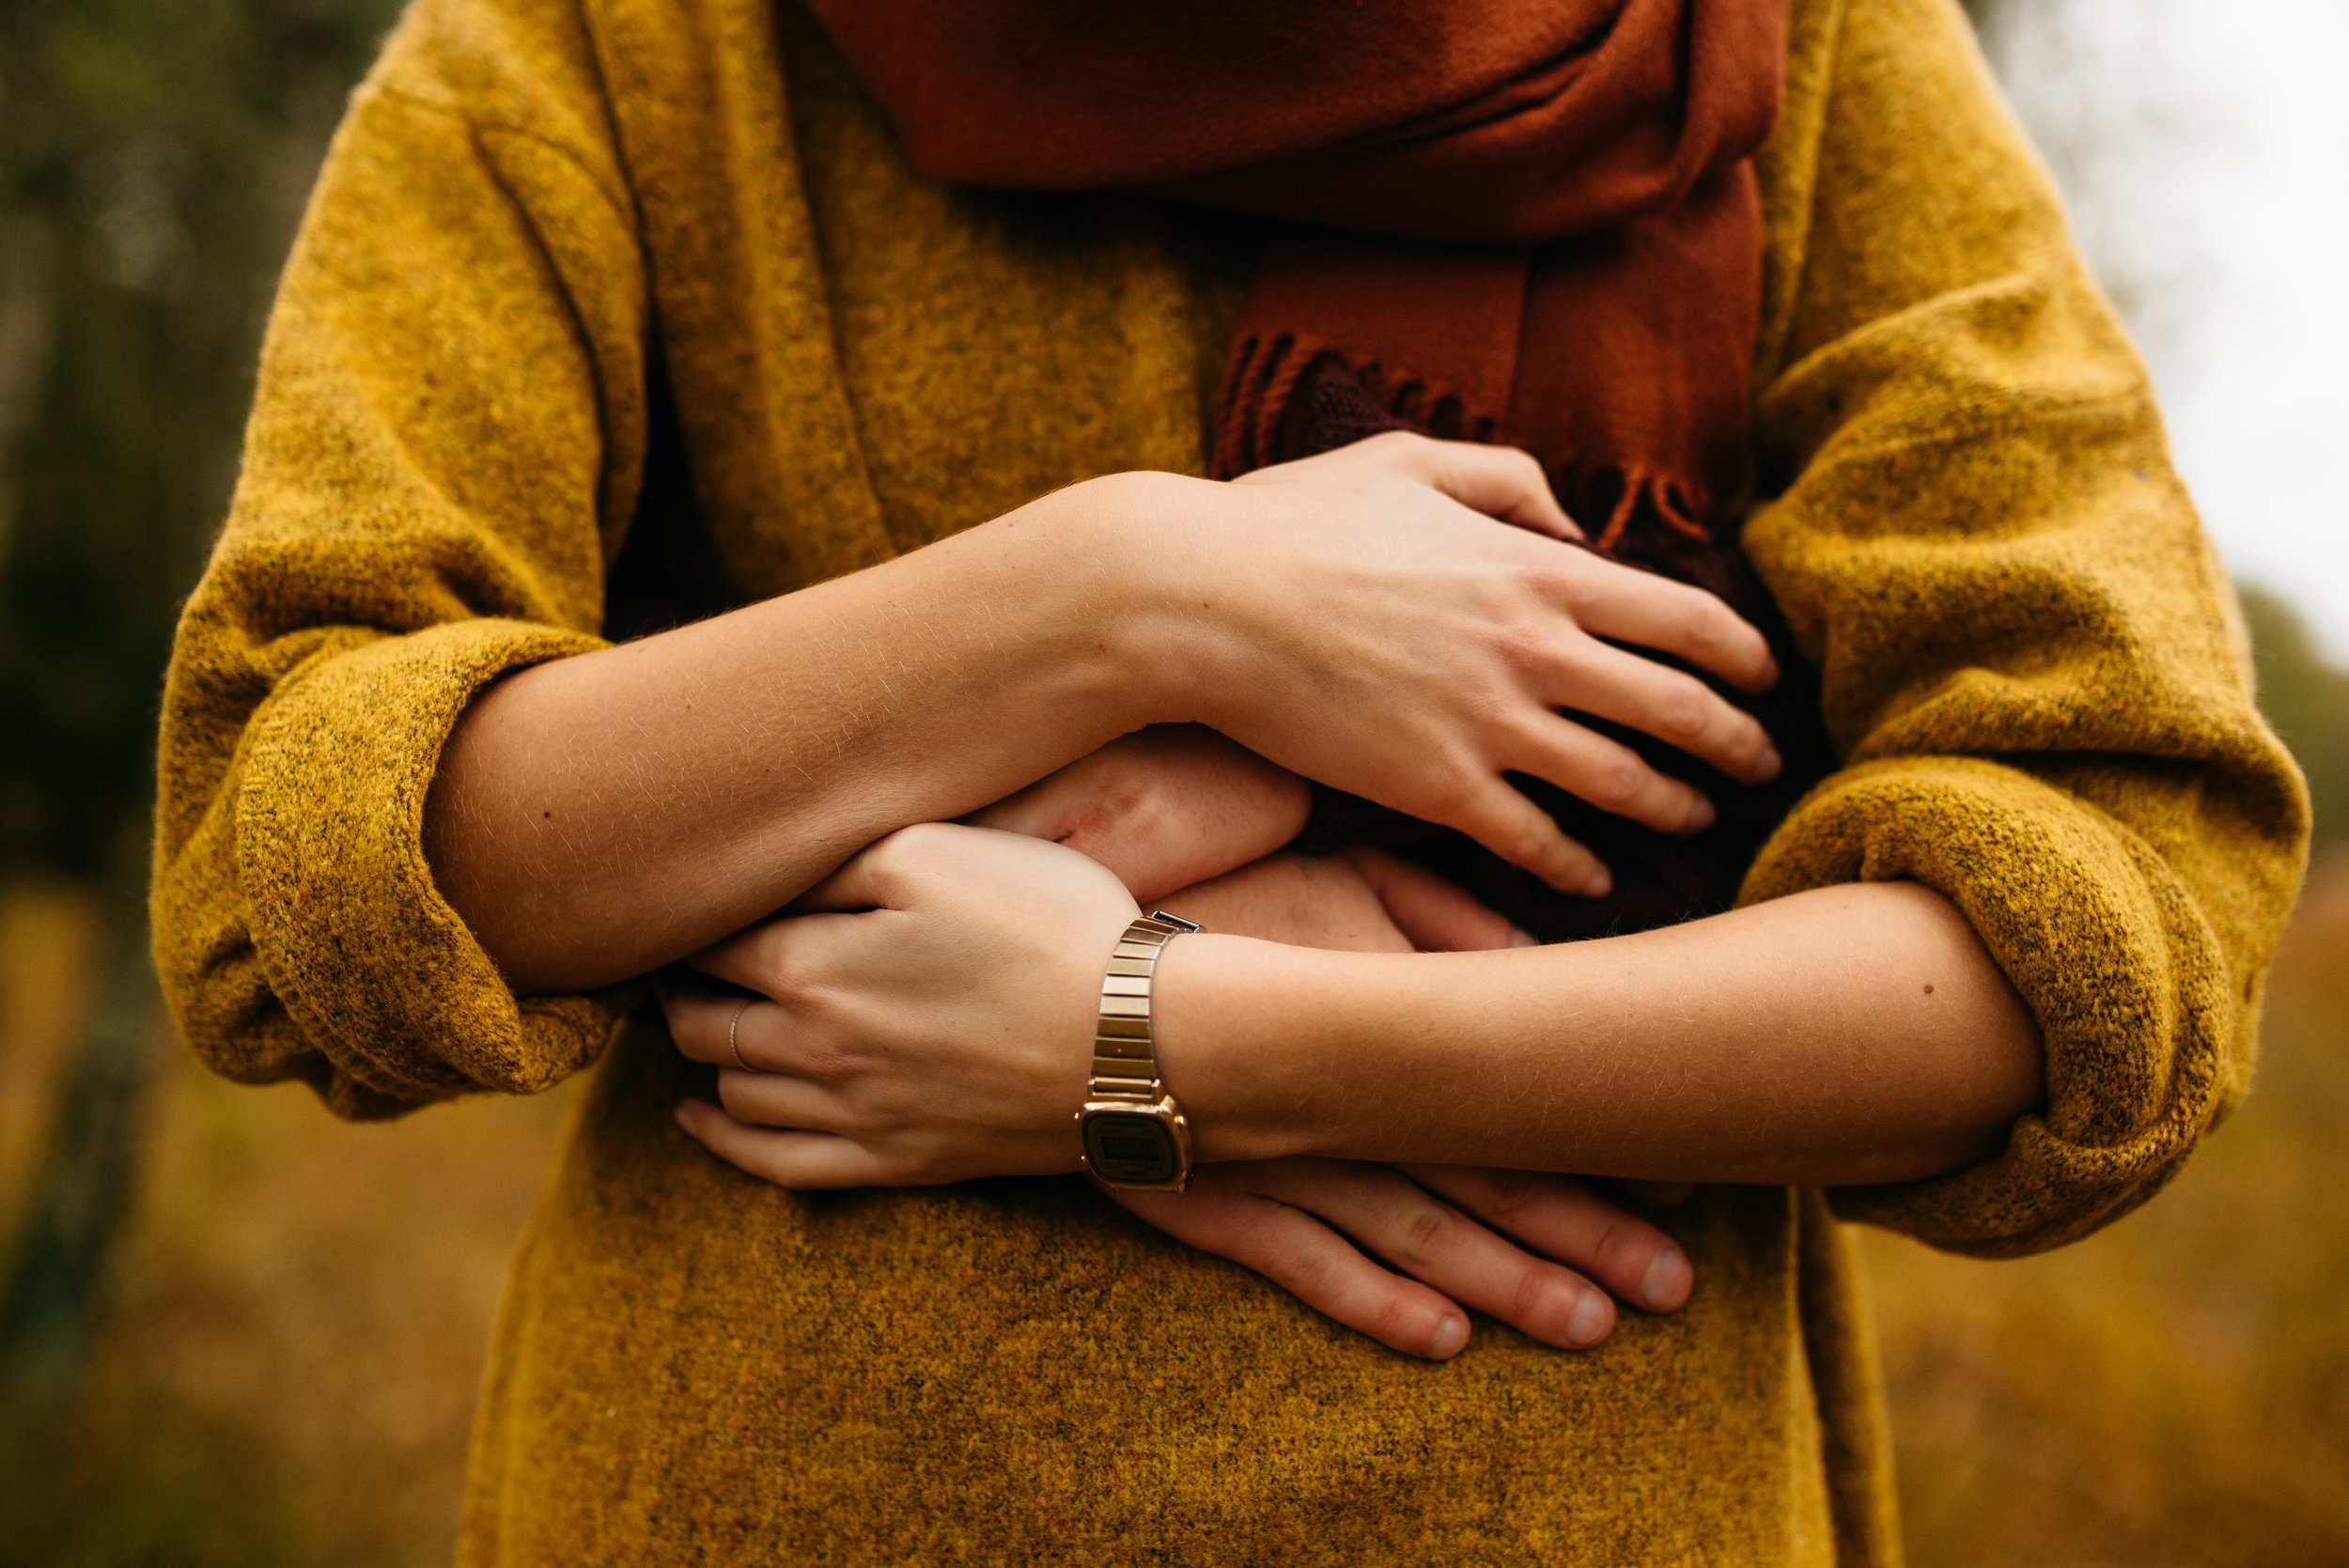 man holding woman partnership yellow hug embrace